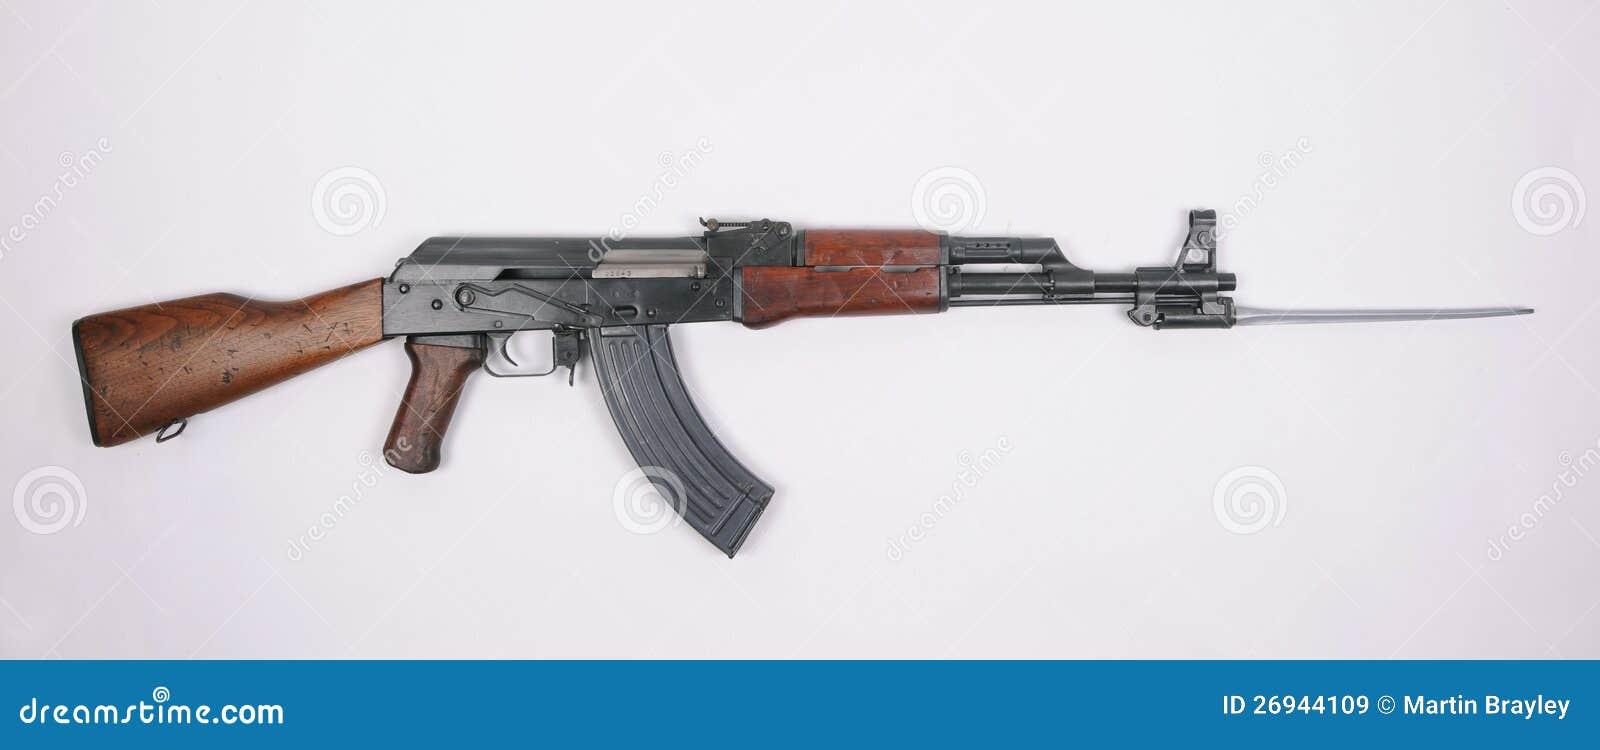 Chinese Type 56 Kalashnikov with bayonet